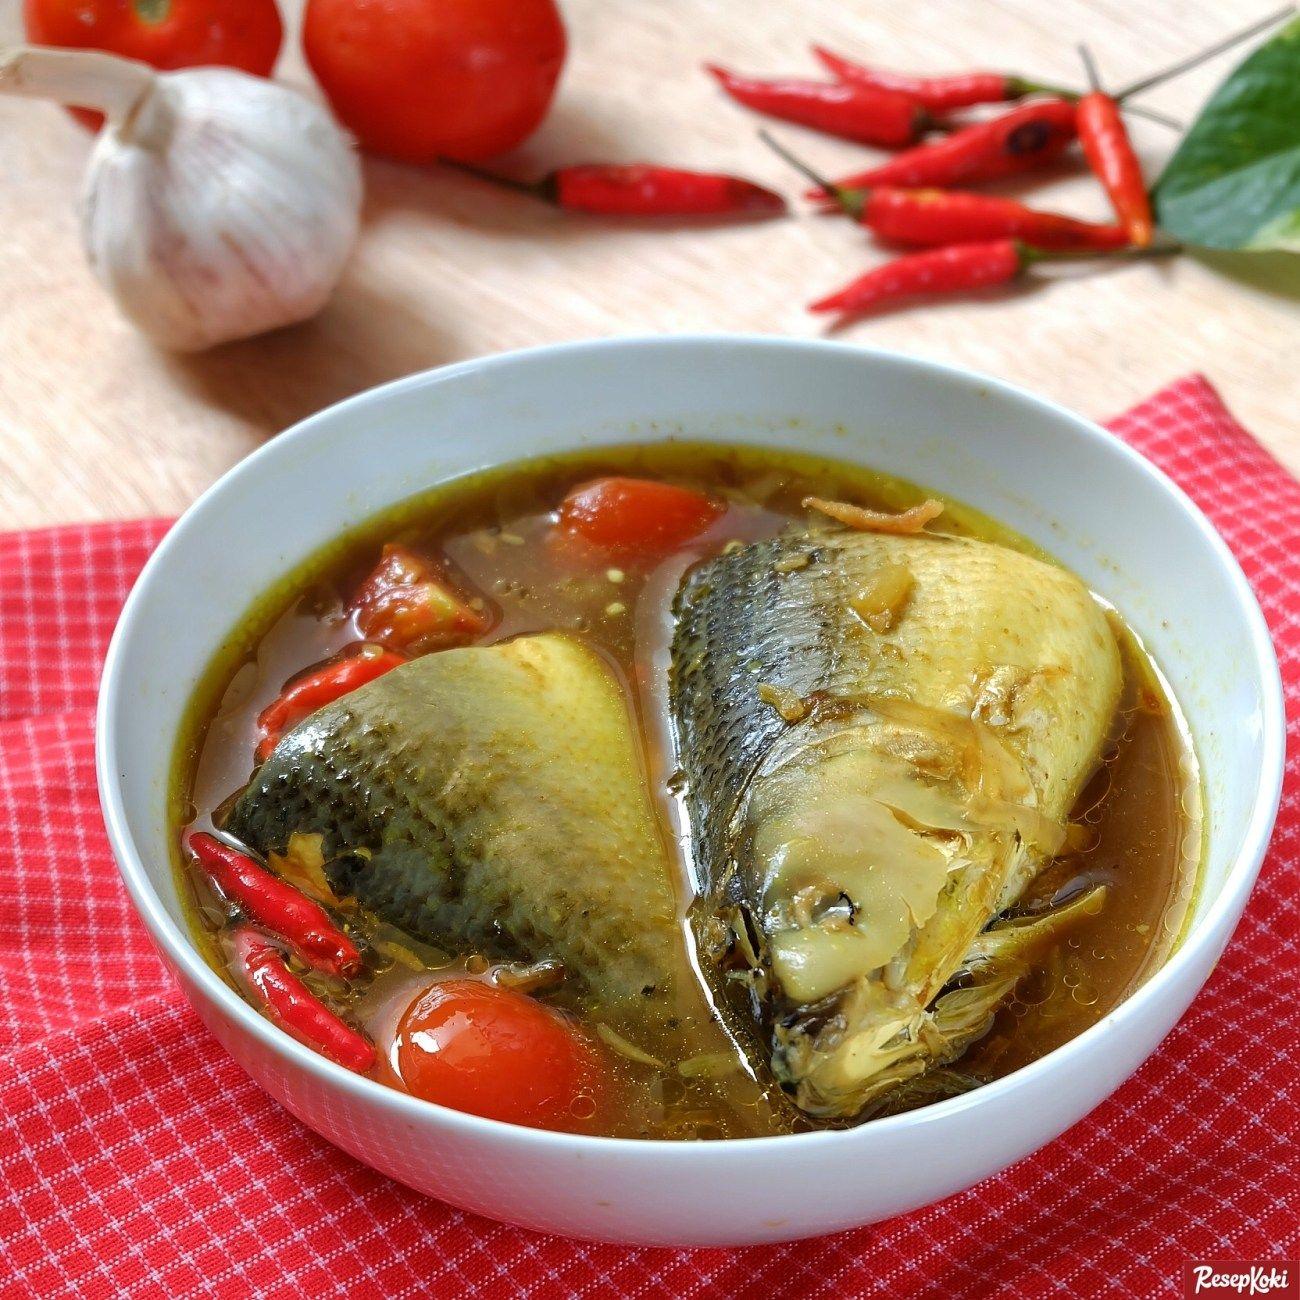 Palumara Bandeng Khas Makassar Praktis Lezat Resep Resepkoki Resep Di 2020 Resep Ikan Resep Resep Sarden